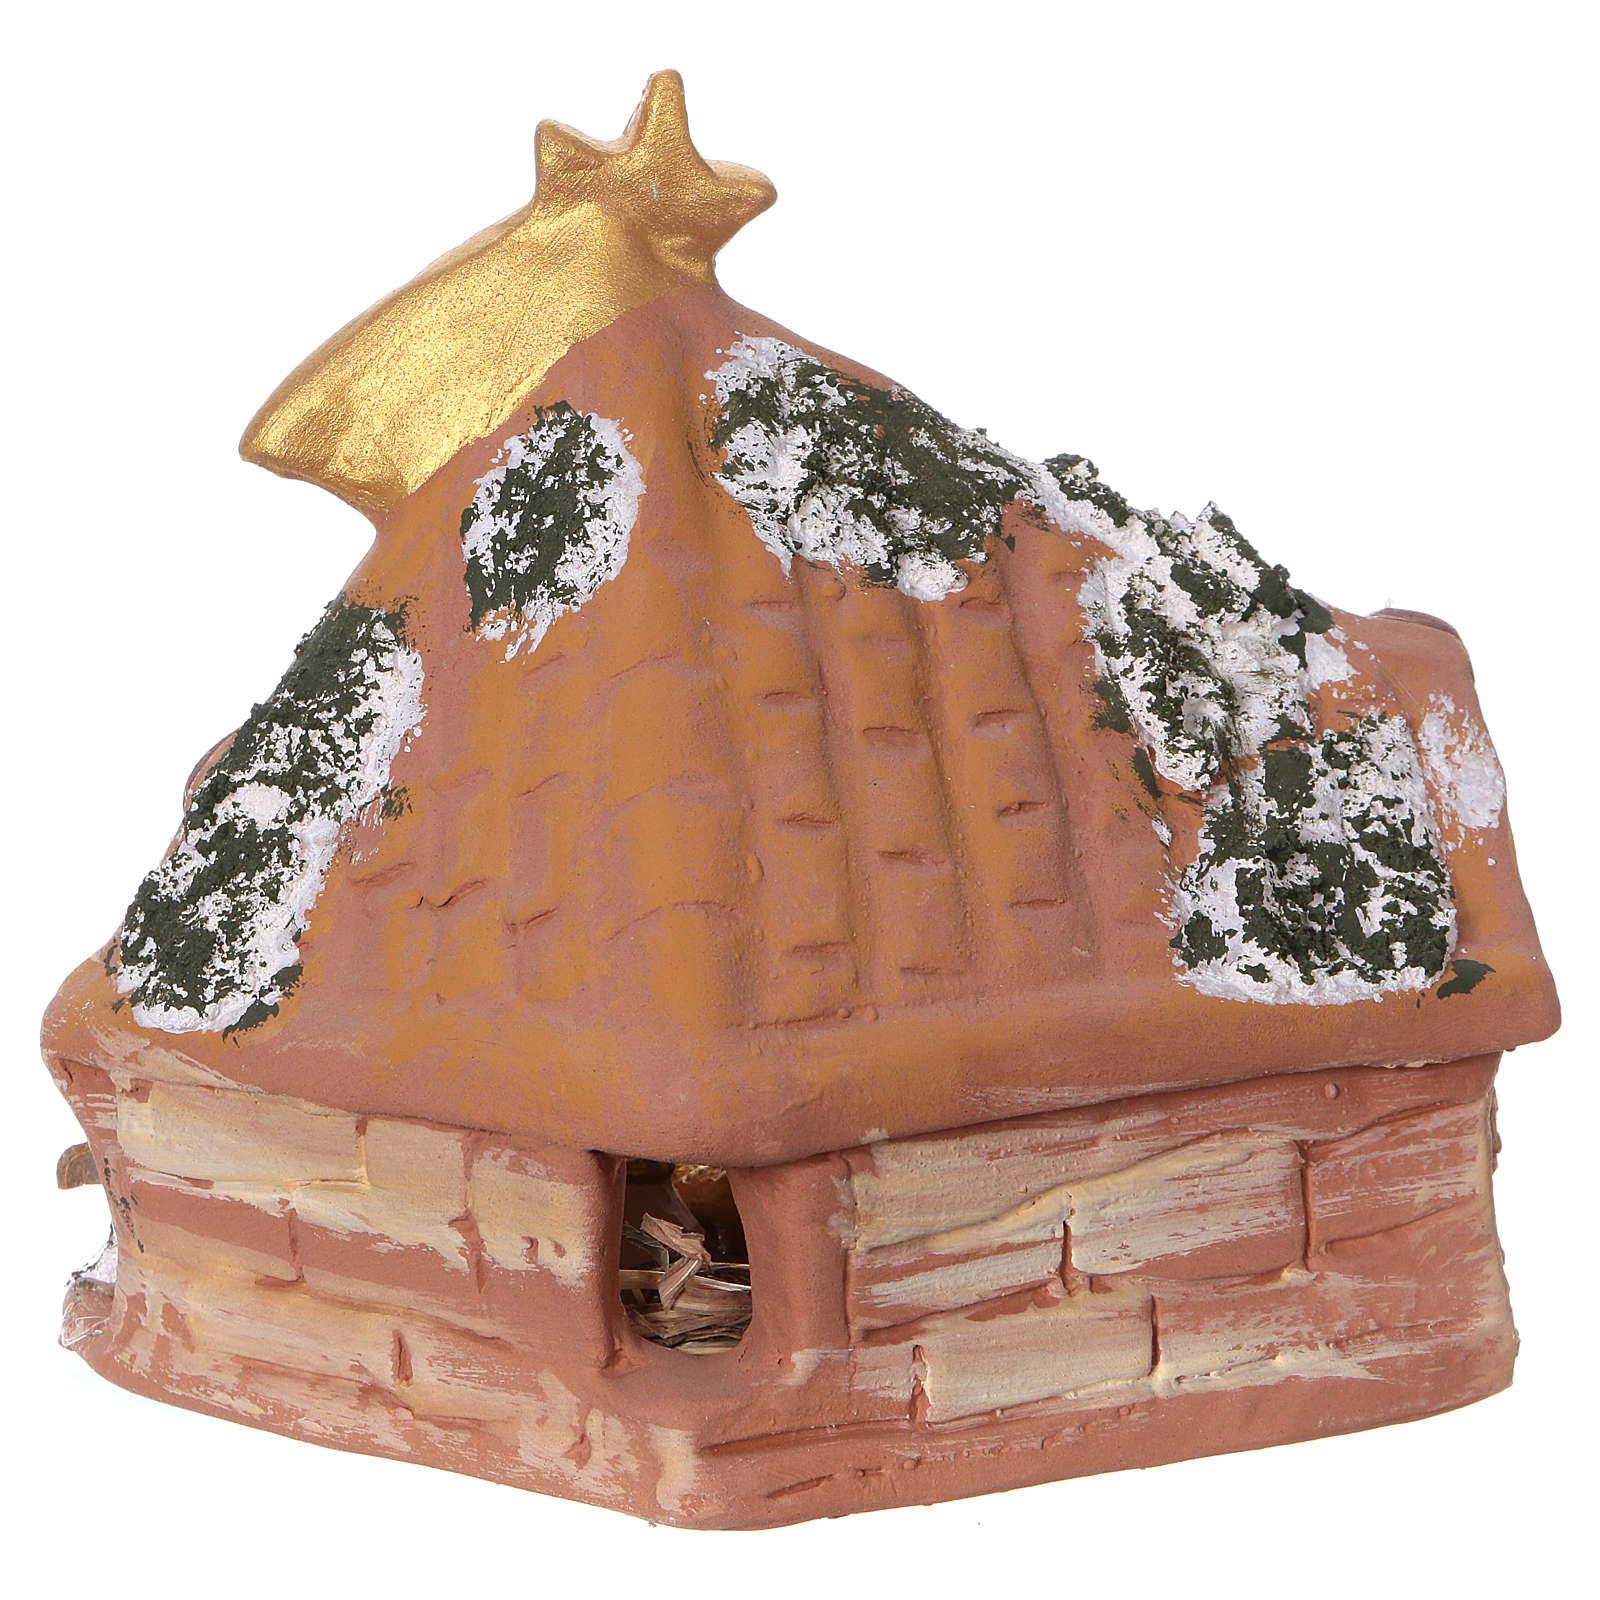 Coloured terracotta hut with 6 cm Nativity scene and comet made in Deruta 4